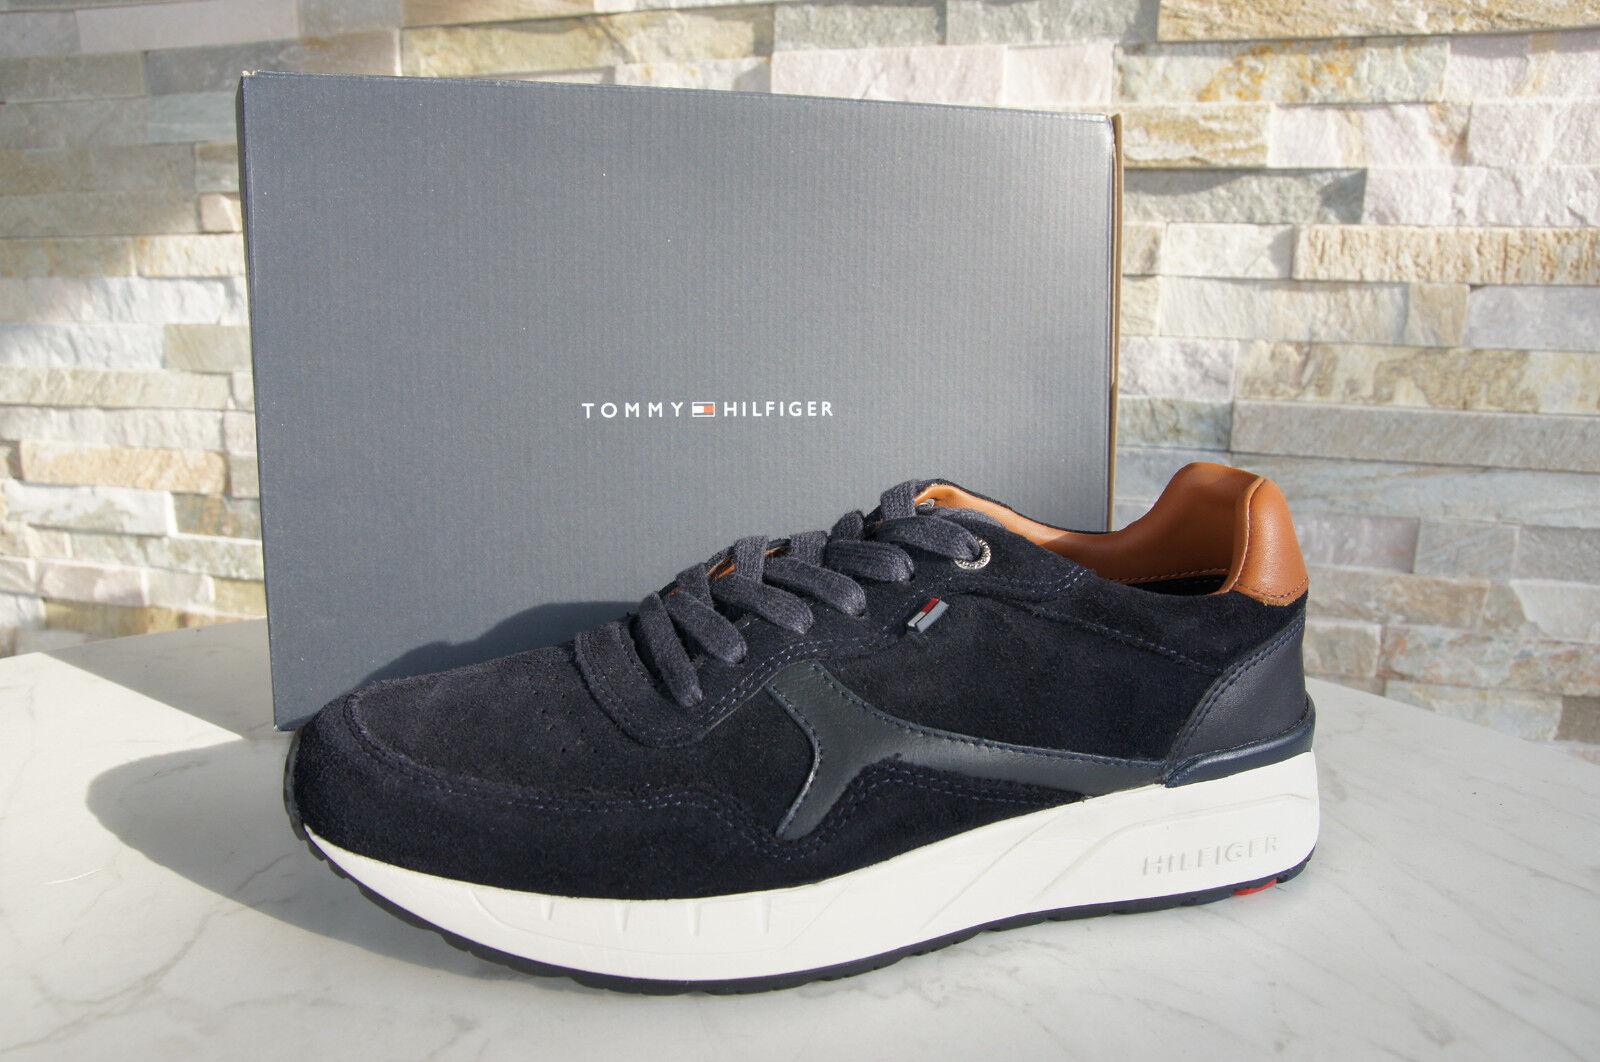 TOMMY HILFIGER Gr 41 Sneakers NEU SchnürZapatos Zapatos RUSH dunkelblau NEU Sneakers UVP 135 6b2ae5